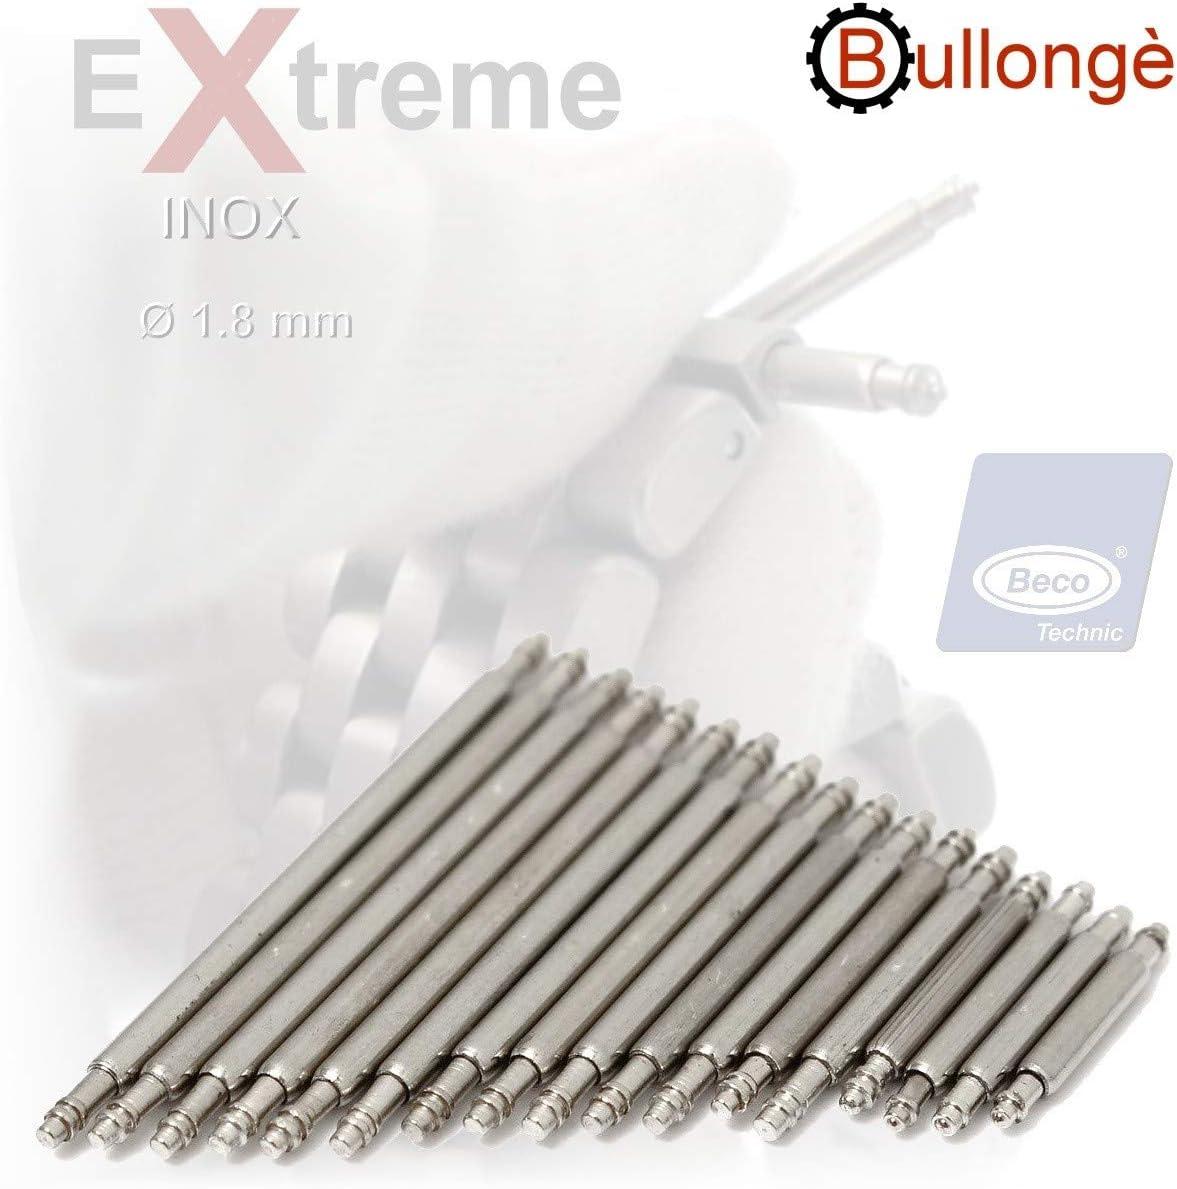 360 extra fuerte Inox barras de resorte 1.8mm Beco Technic